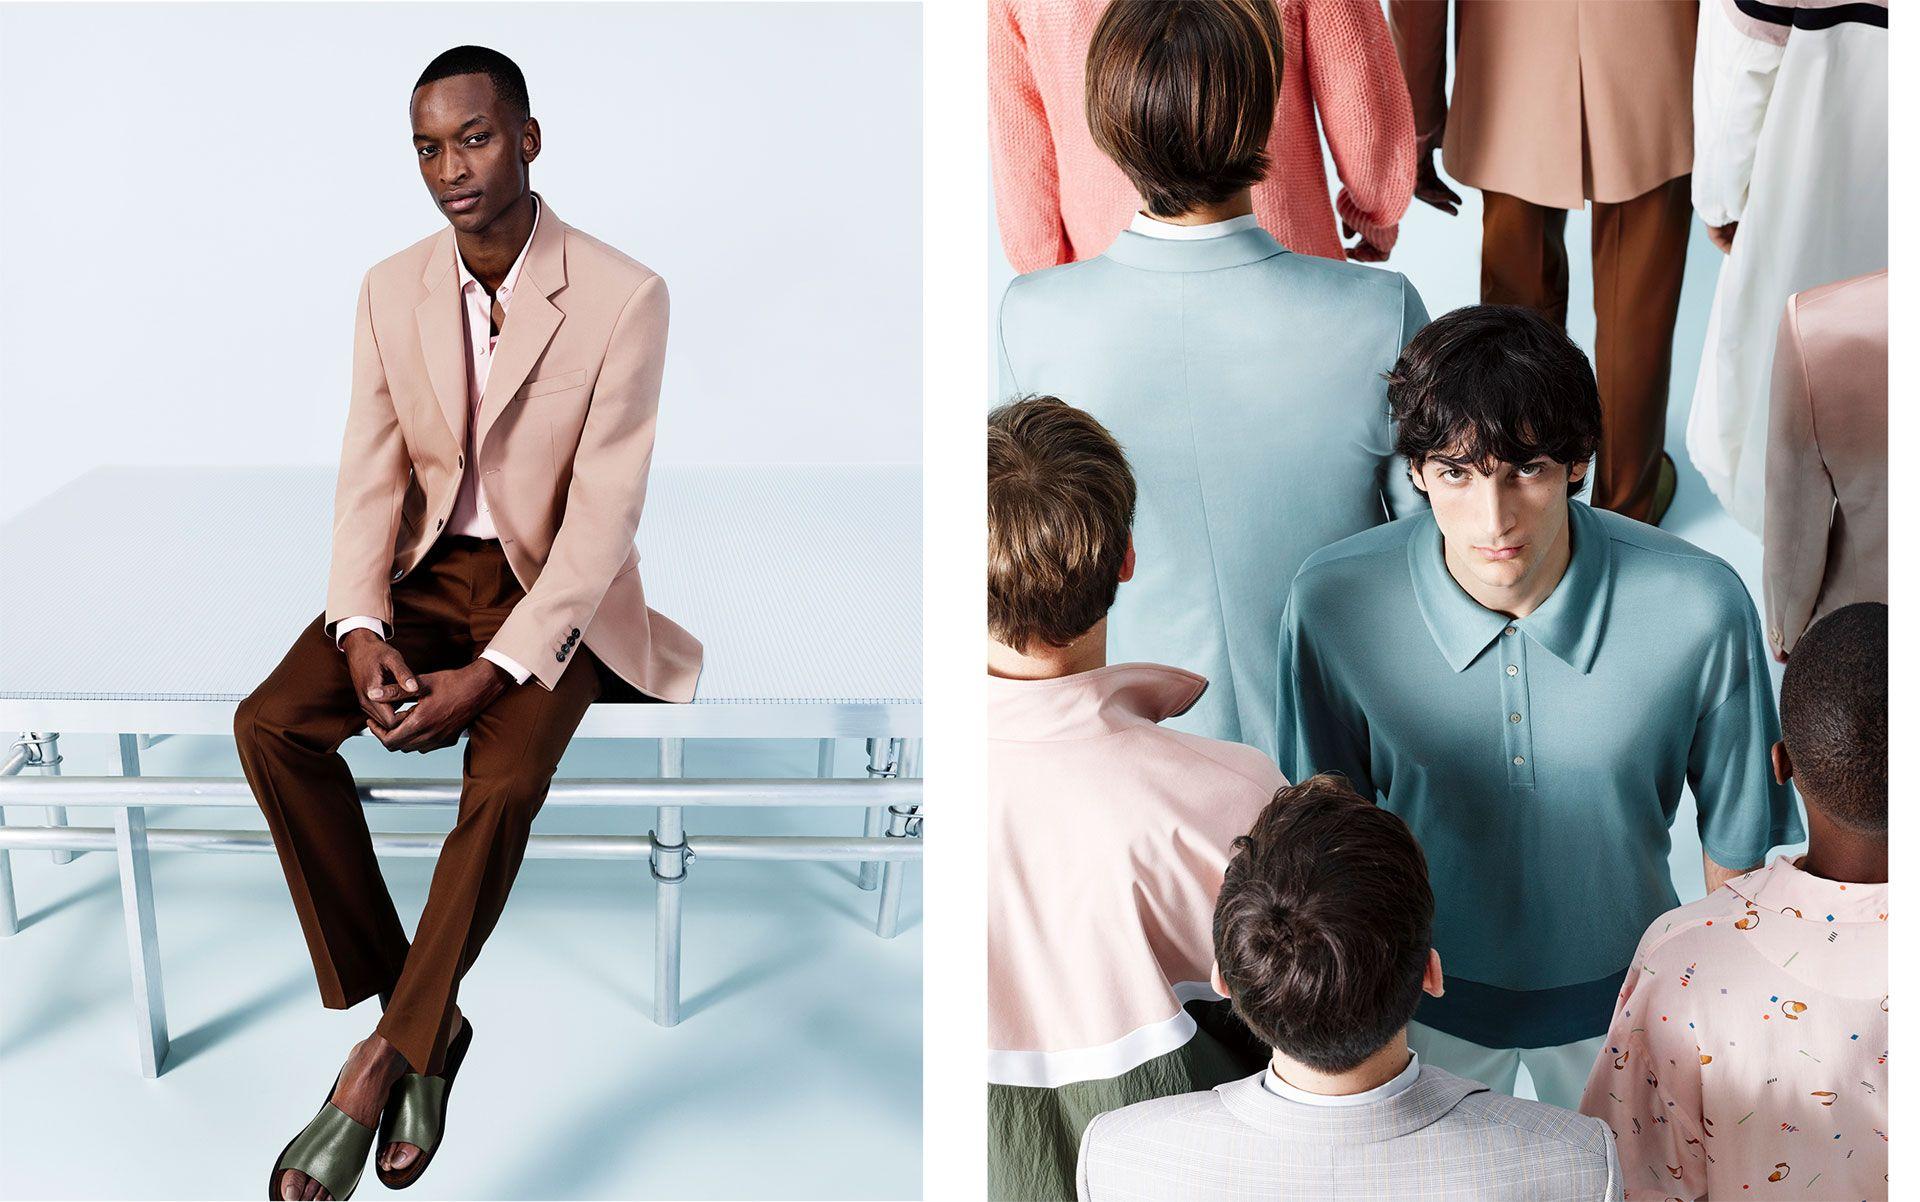 a60e8231 Zara Man Launches Spring/Summer 2018 Campaign – PAUSE Online | Men's  Fashion, Street Style, Fashion News & Streetwear